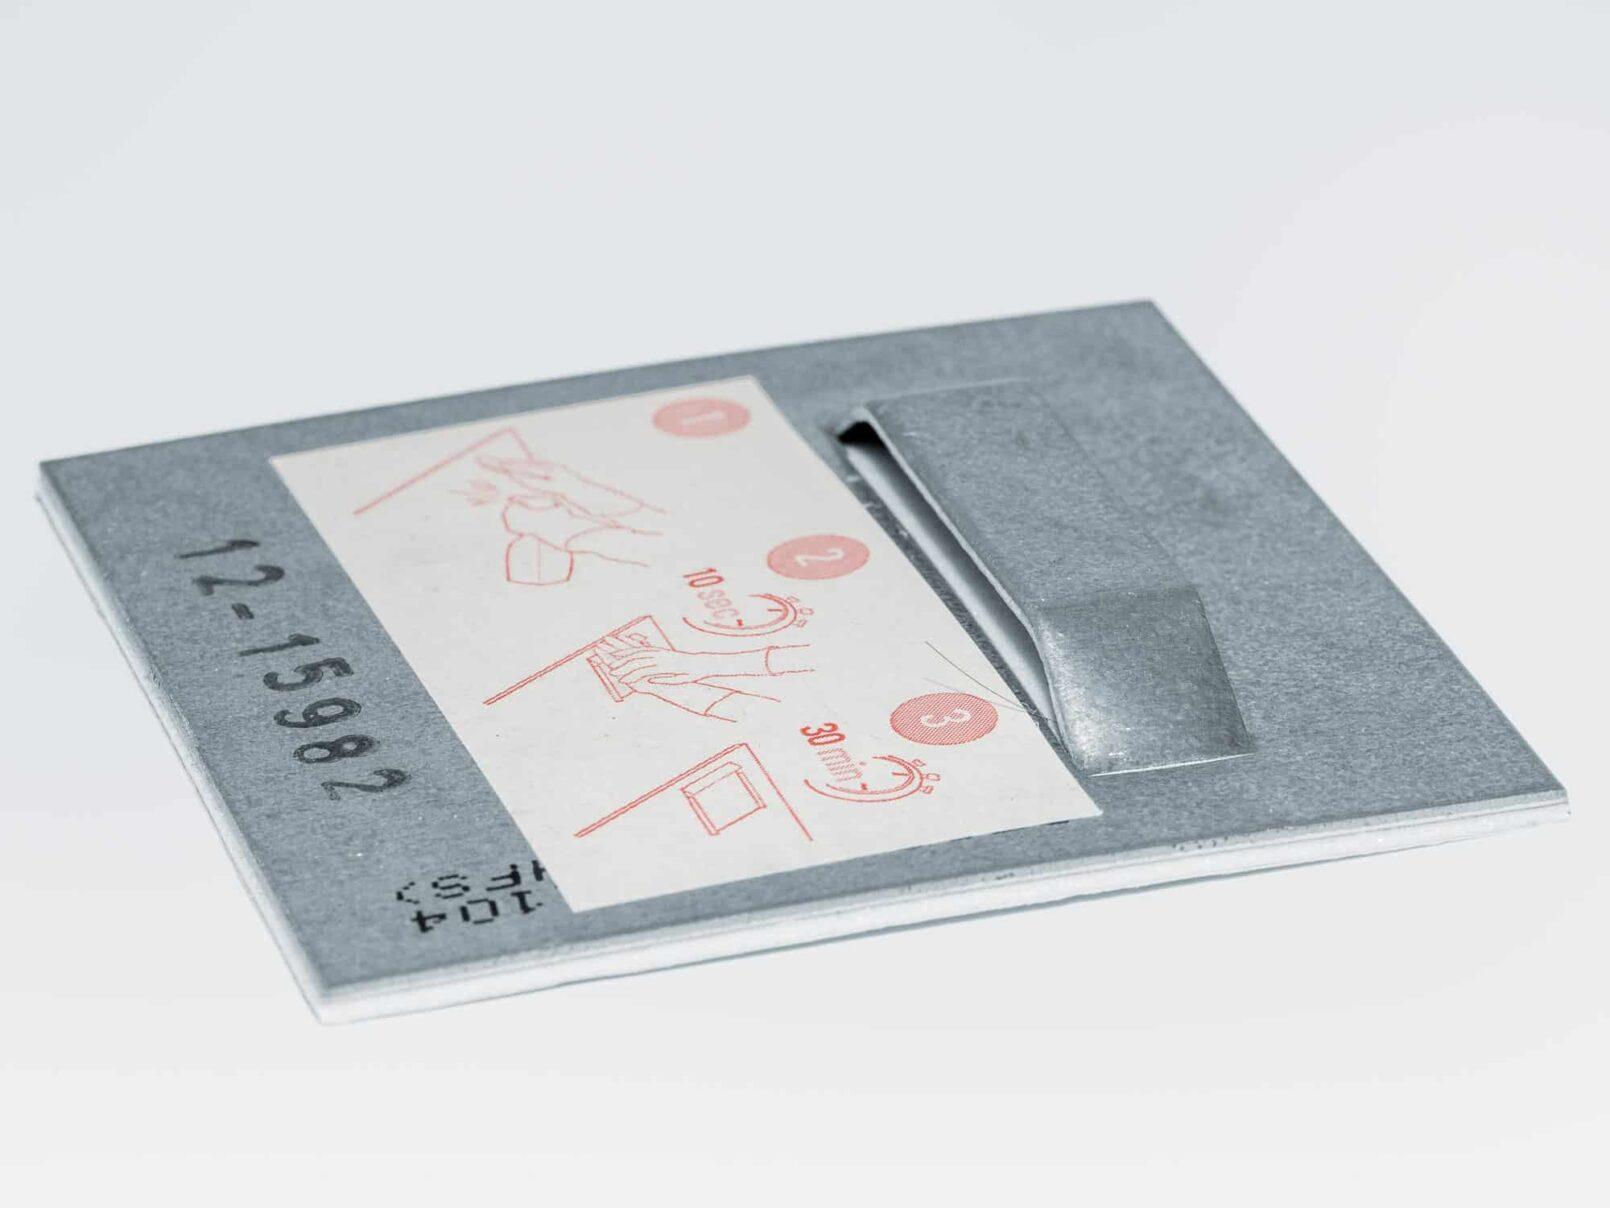 Wandhalter 70*70 mm selbstklebend